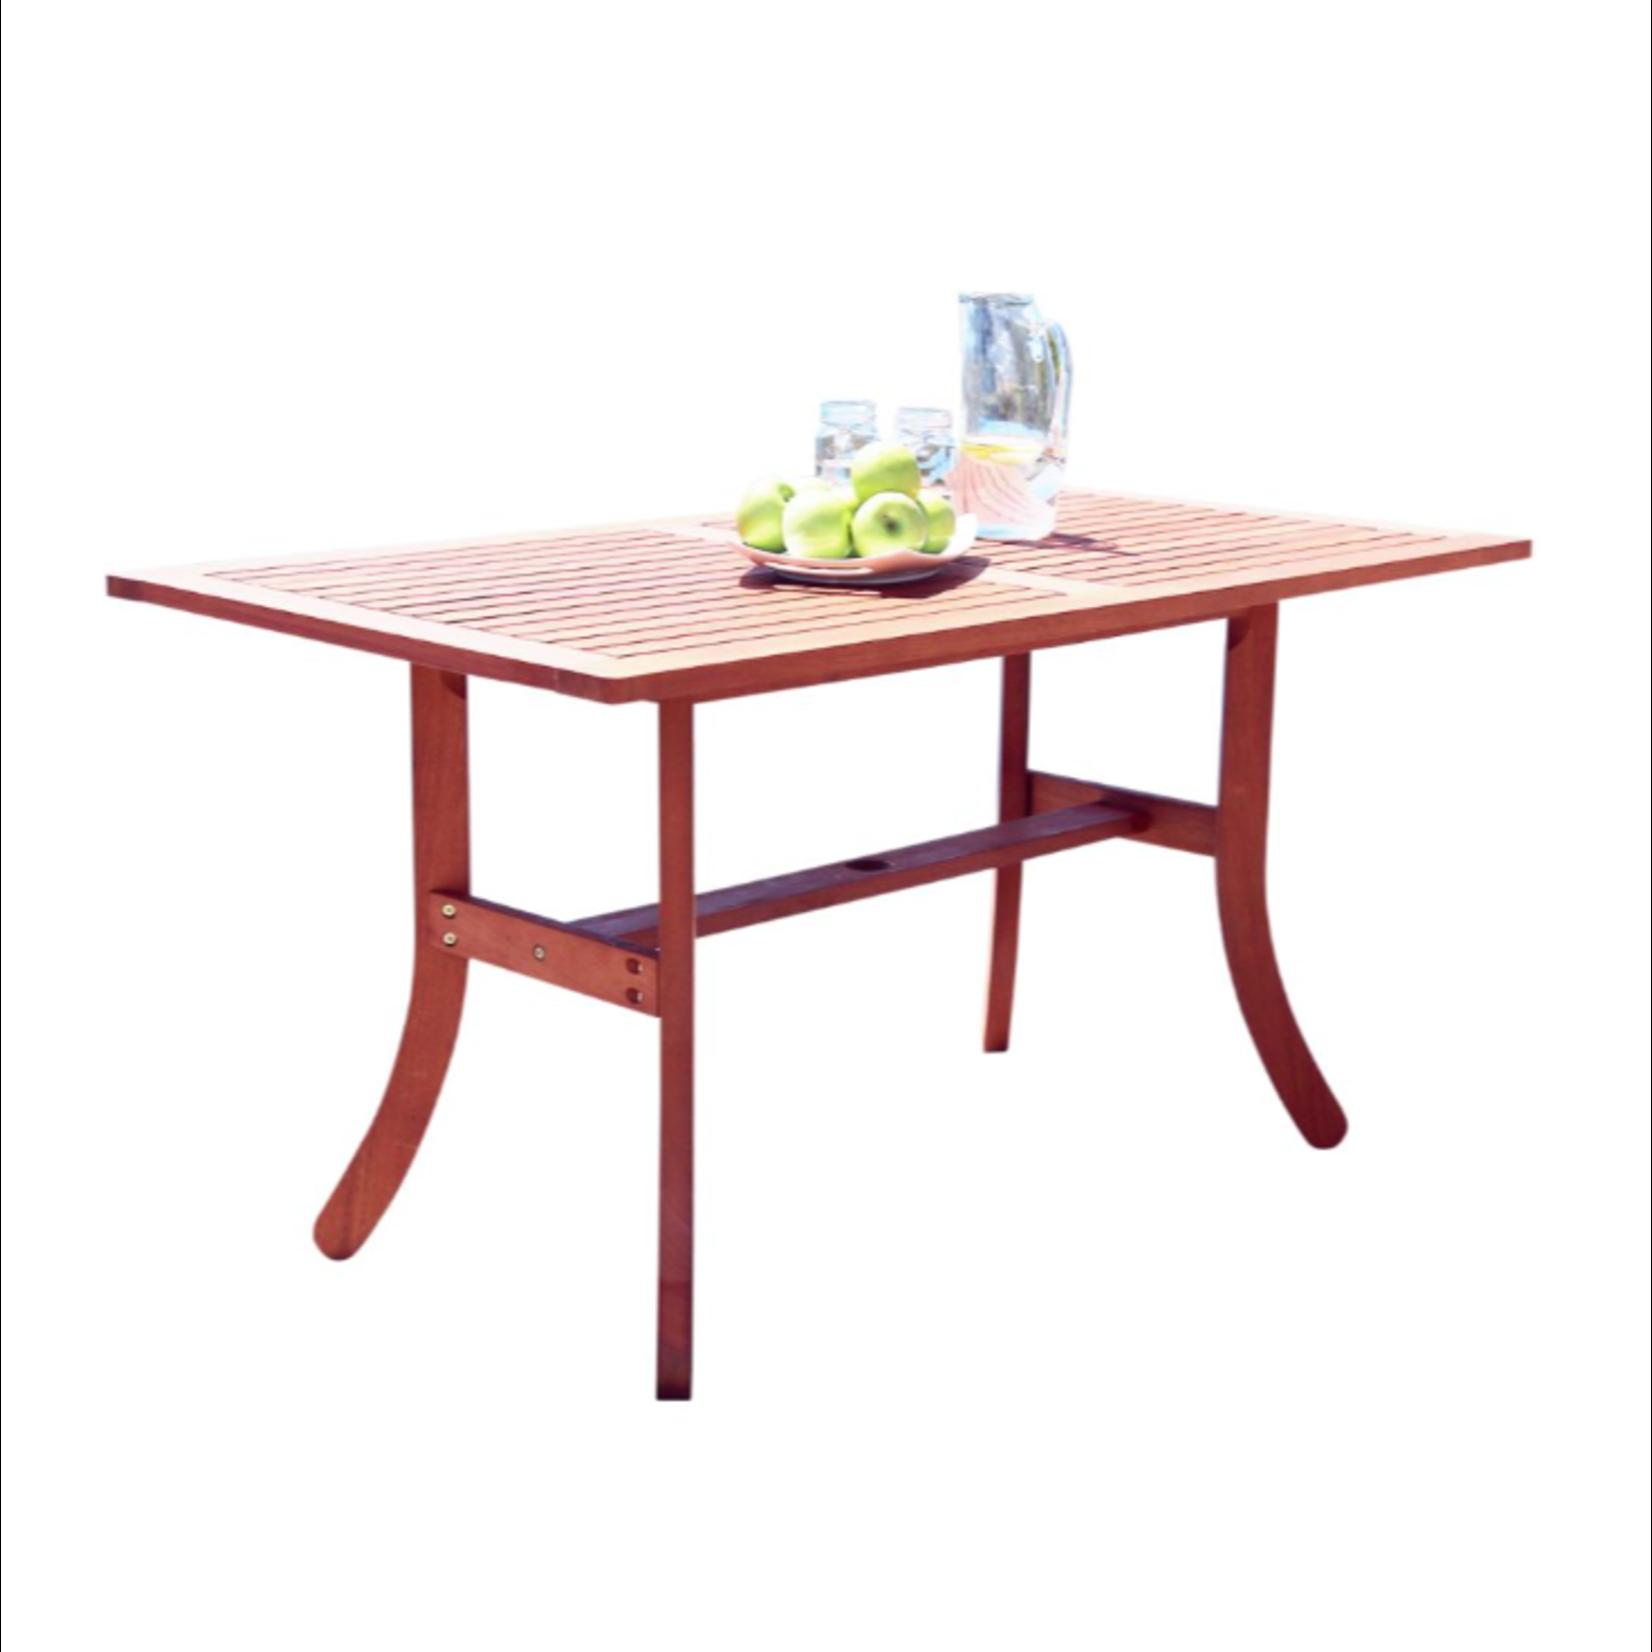 10421 Vifah Outdoor Dining Table Patio Set